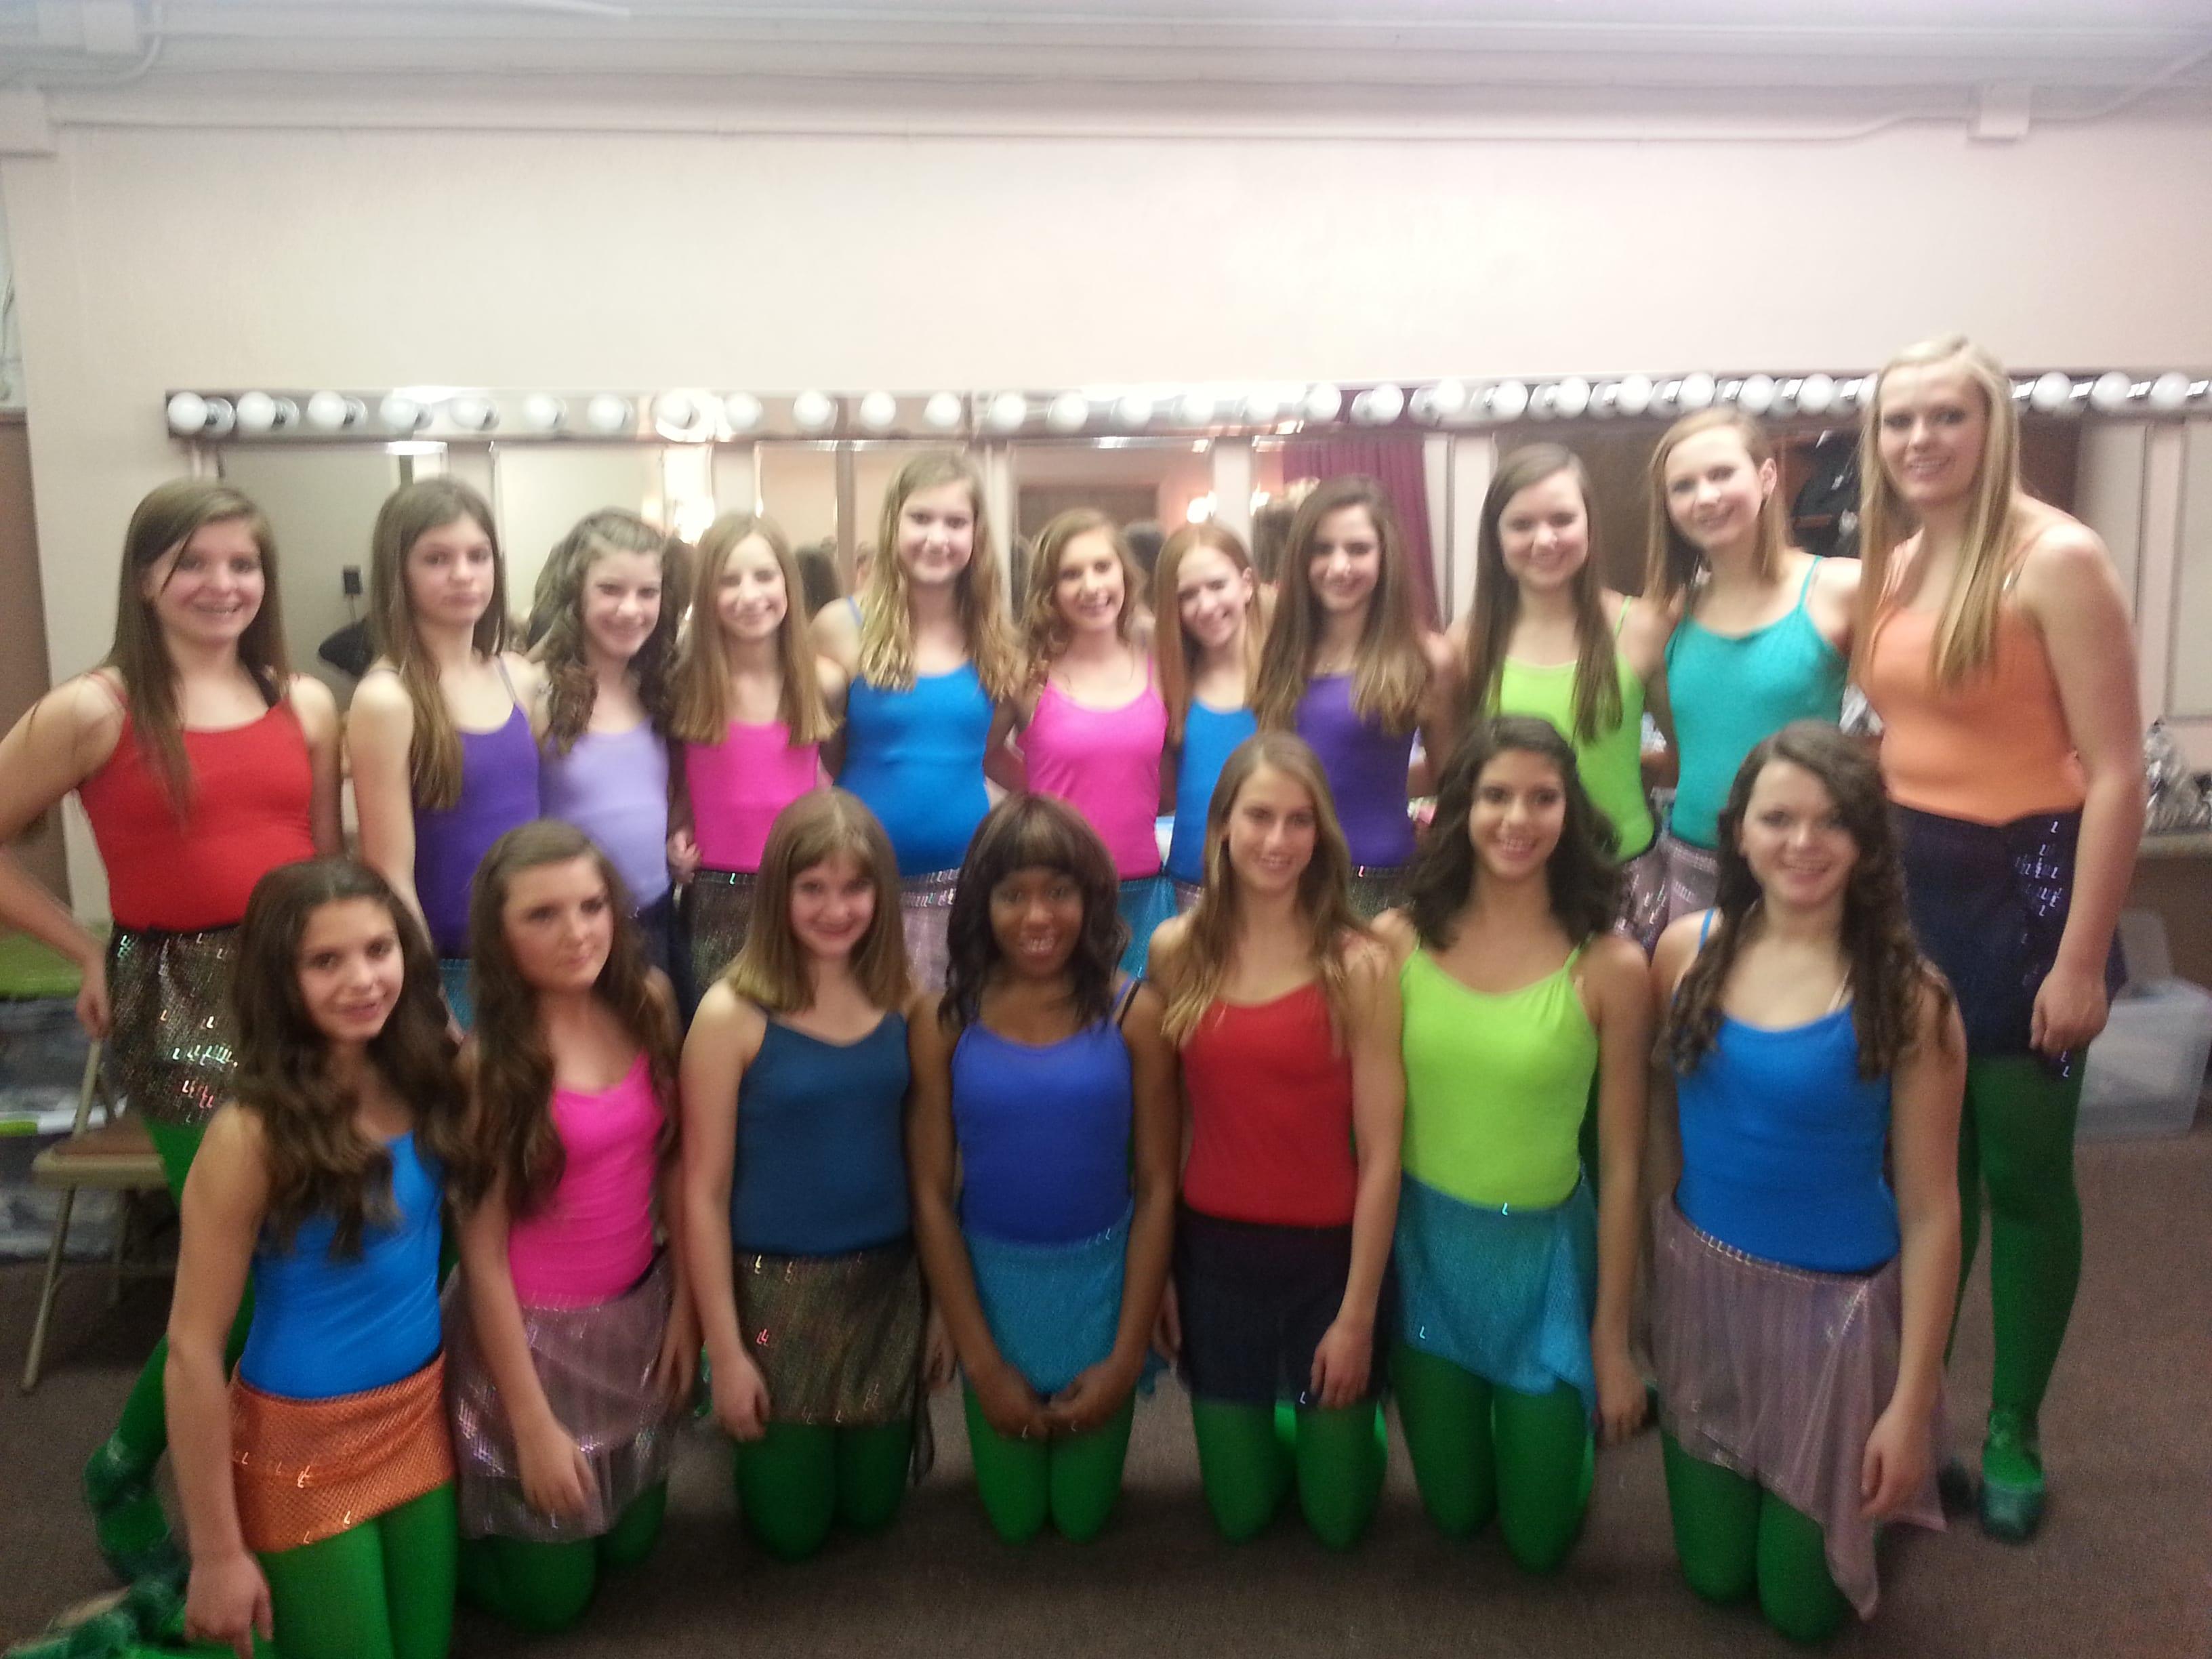 20130317_145251 – Beth Fowler School of Dance : Genoa and St. Charles Illinois